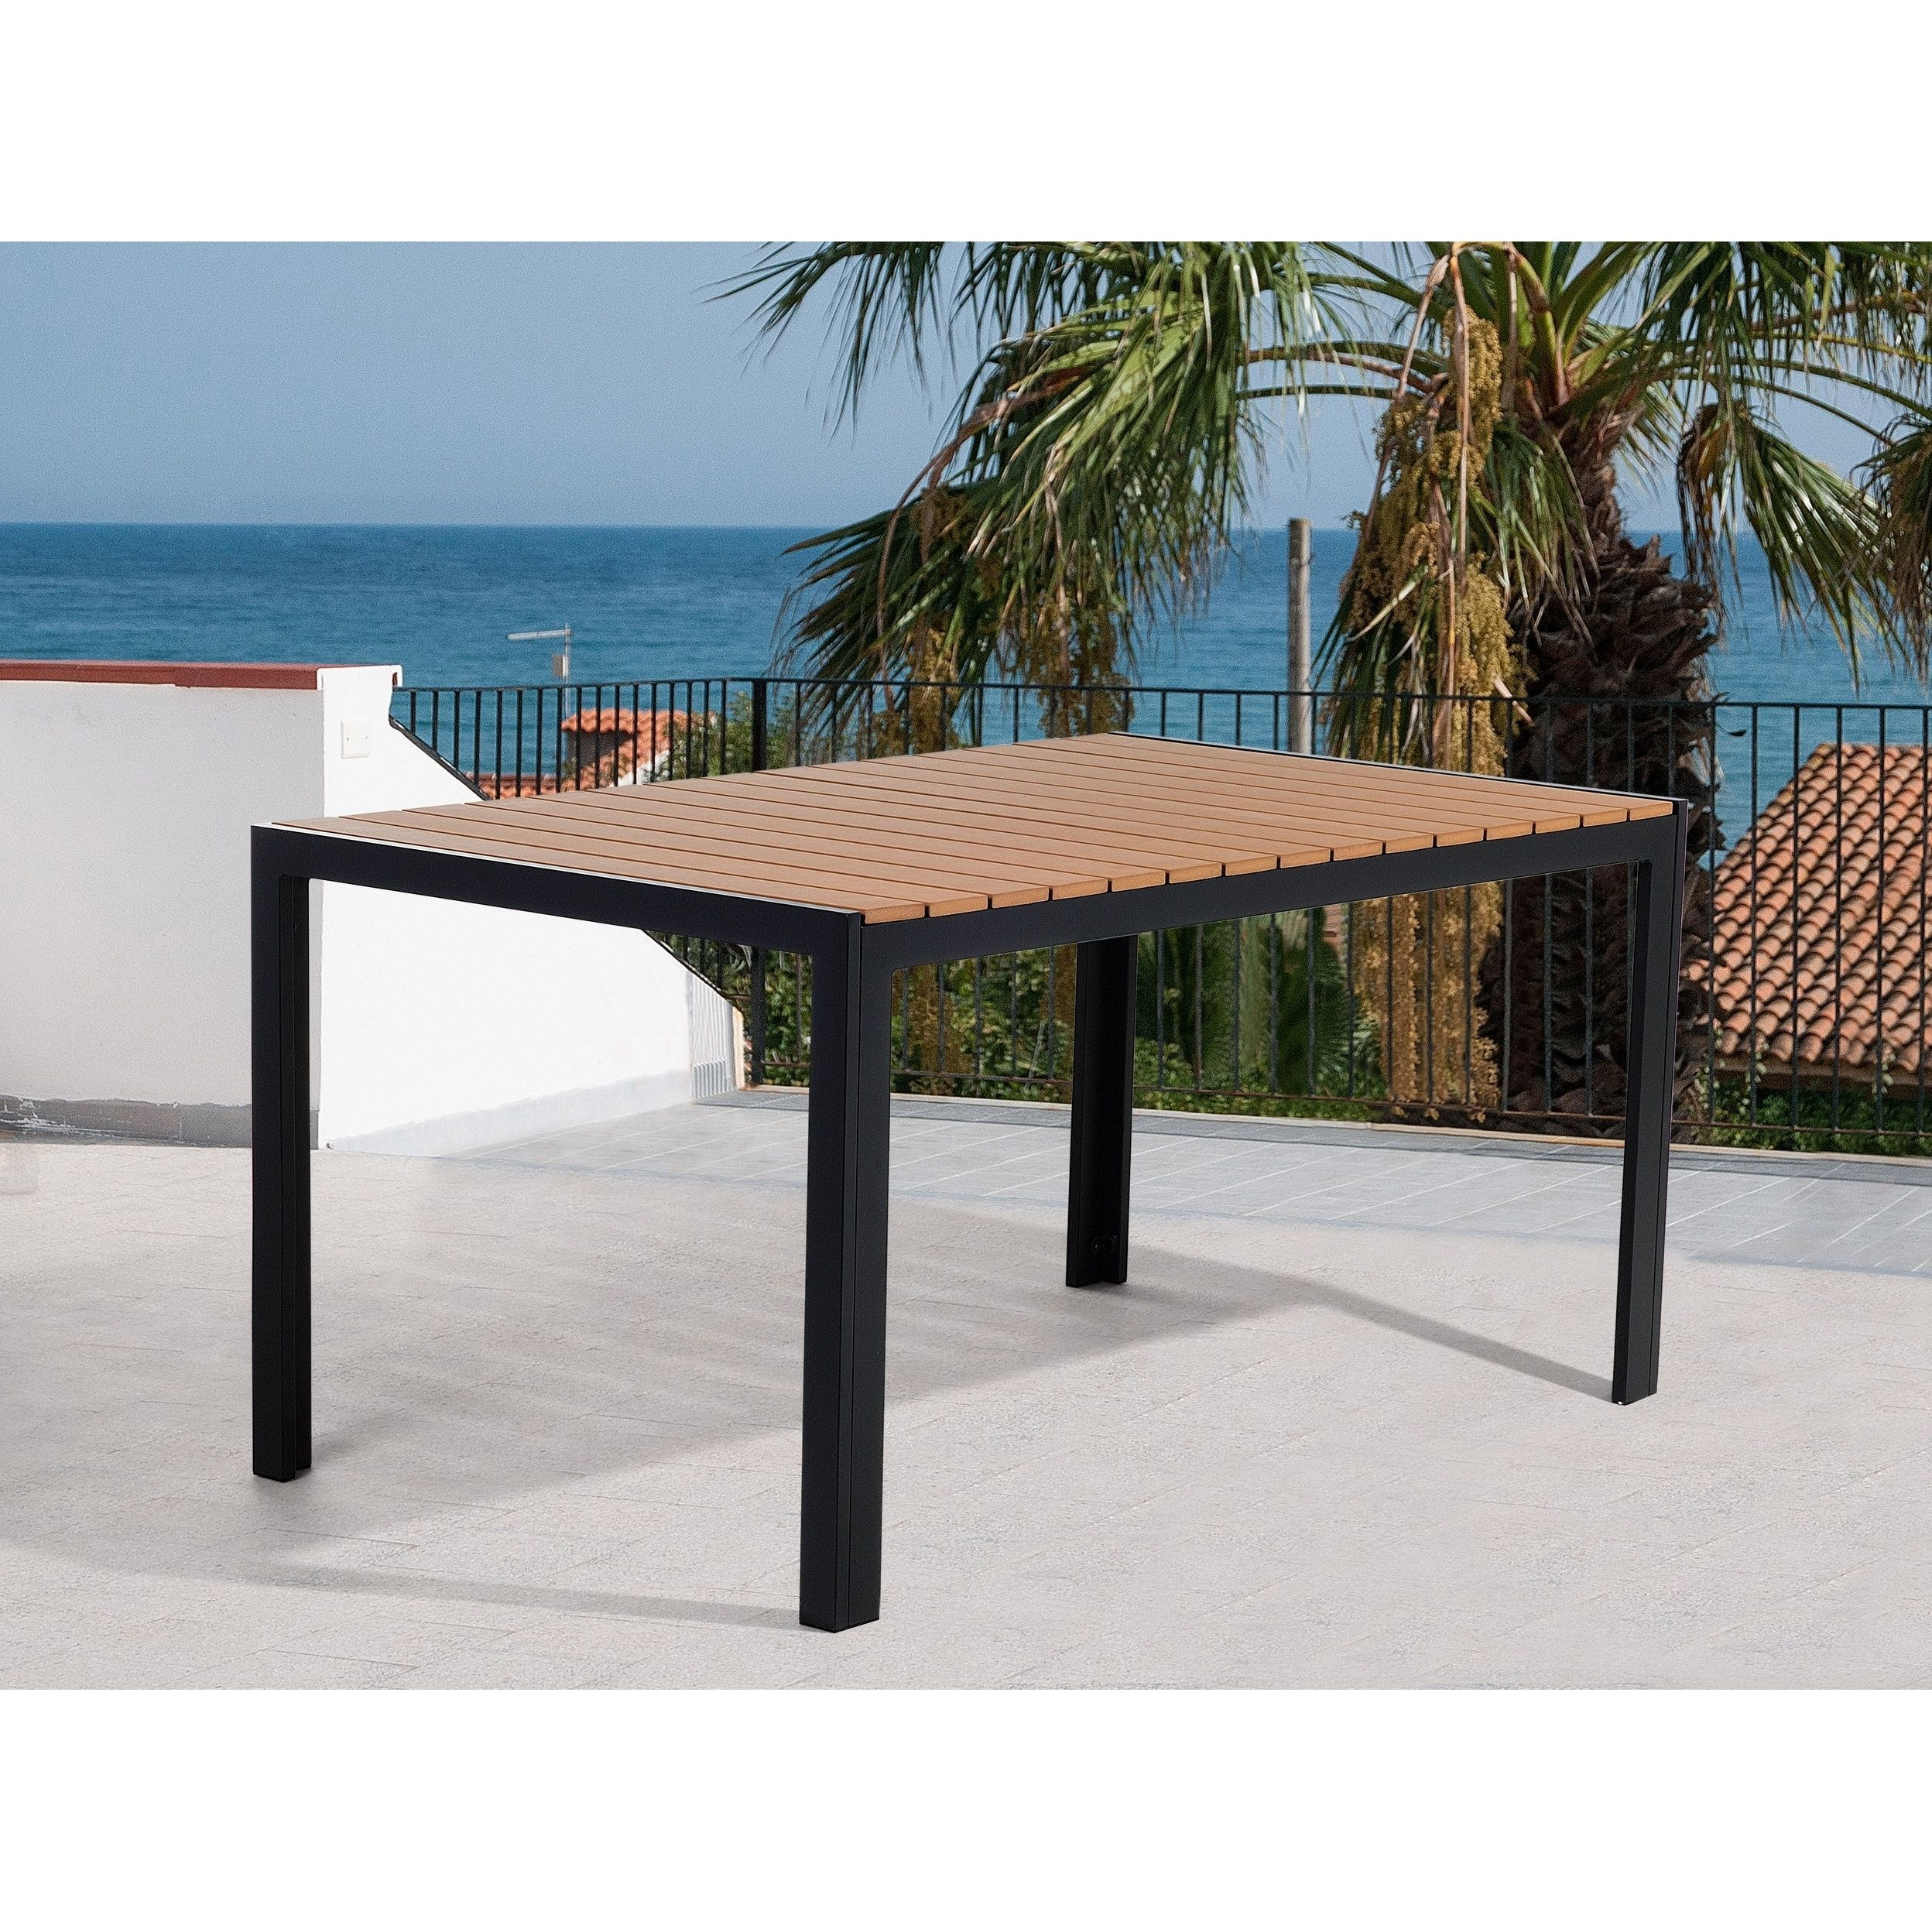 Beliani Poly Resin Patio Dining Table o Brown Patio Furniture